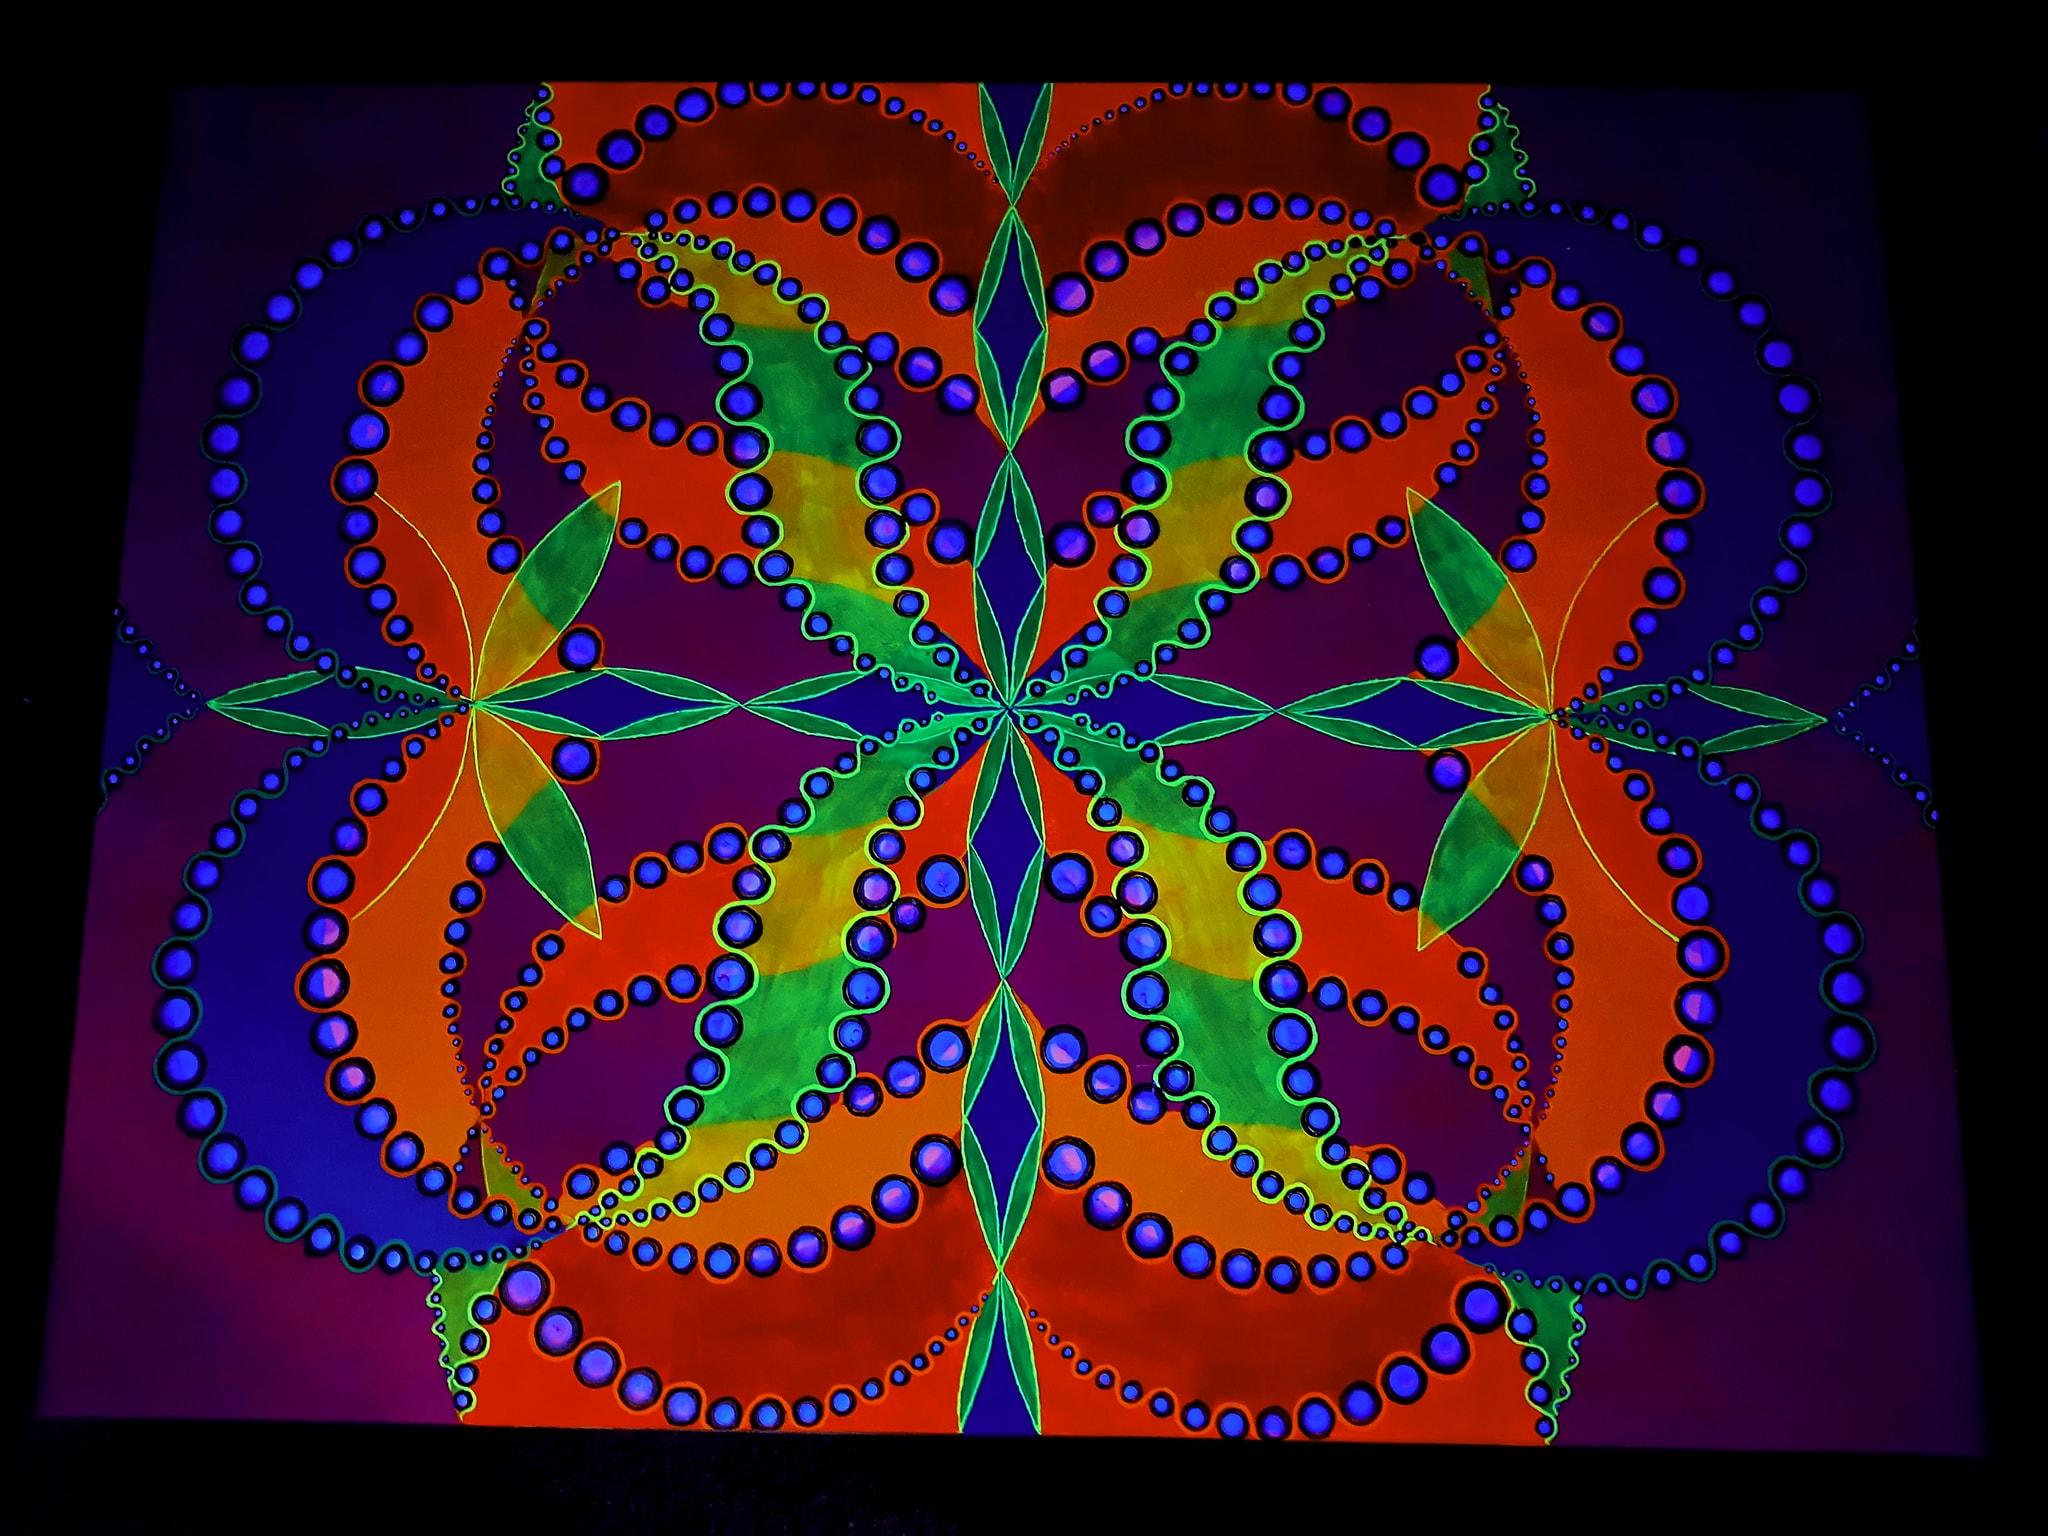 glowing-art-using-uv-glow-paint.jpg